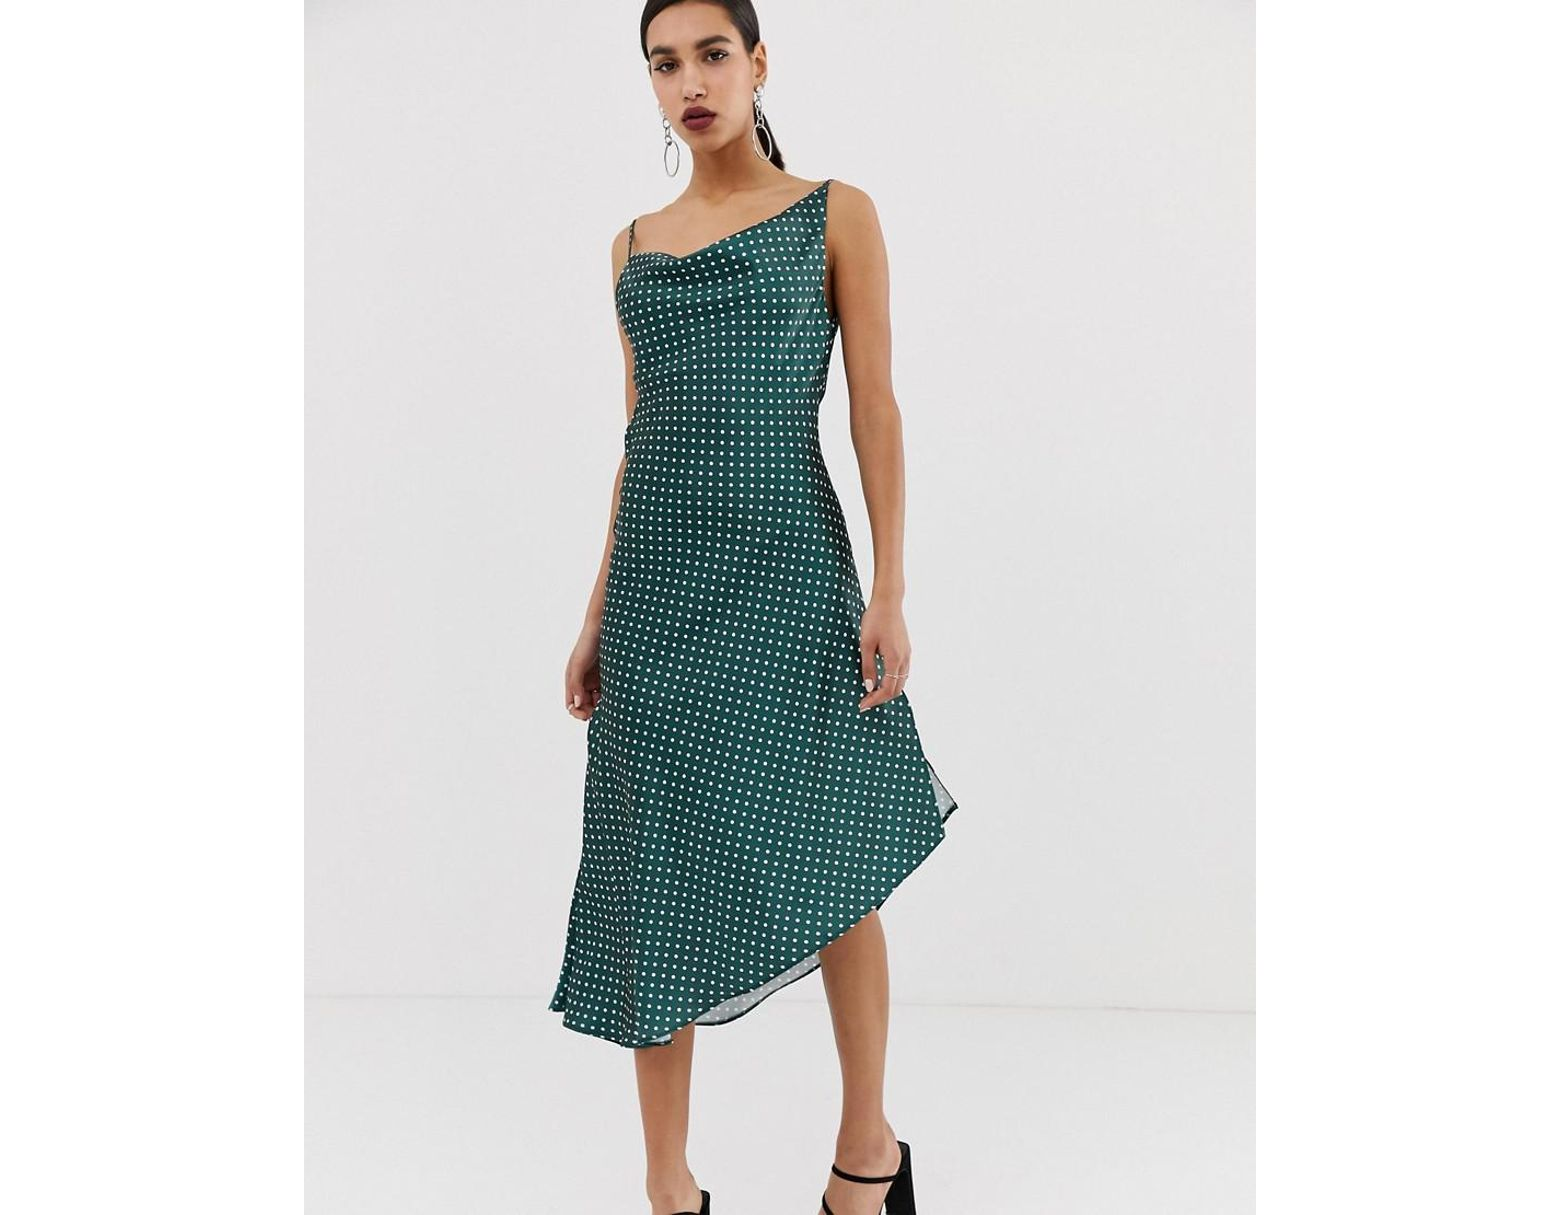 3fa94dacfa84 ASOS Midi Slip Dress In High Shine Satin In Spot Print in Green - Lyst